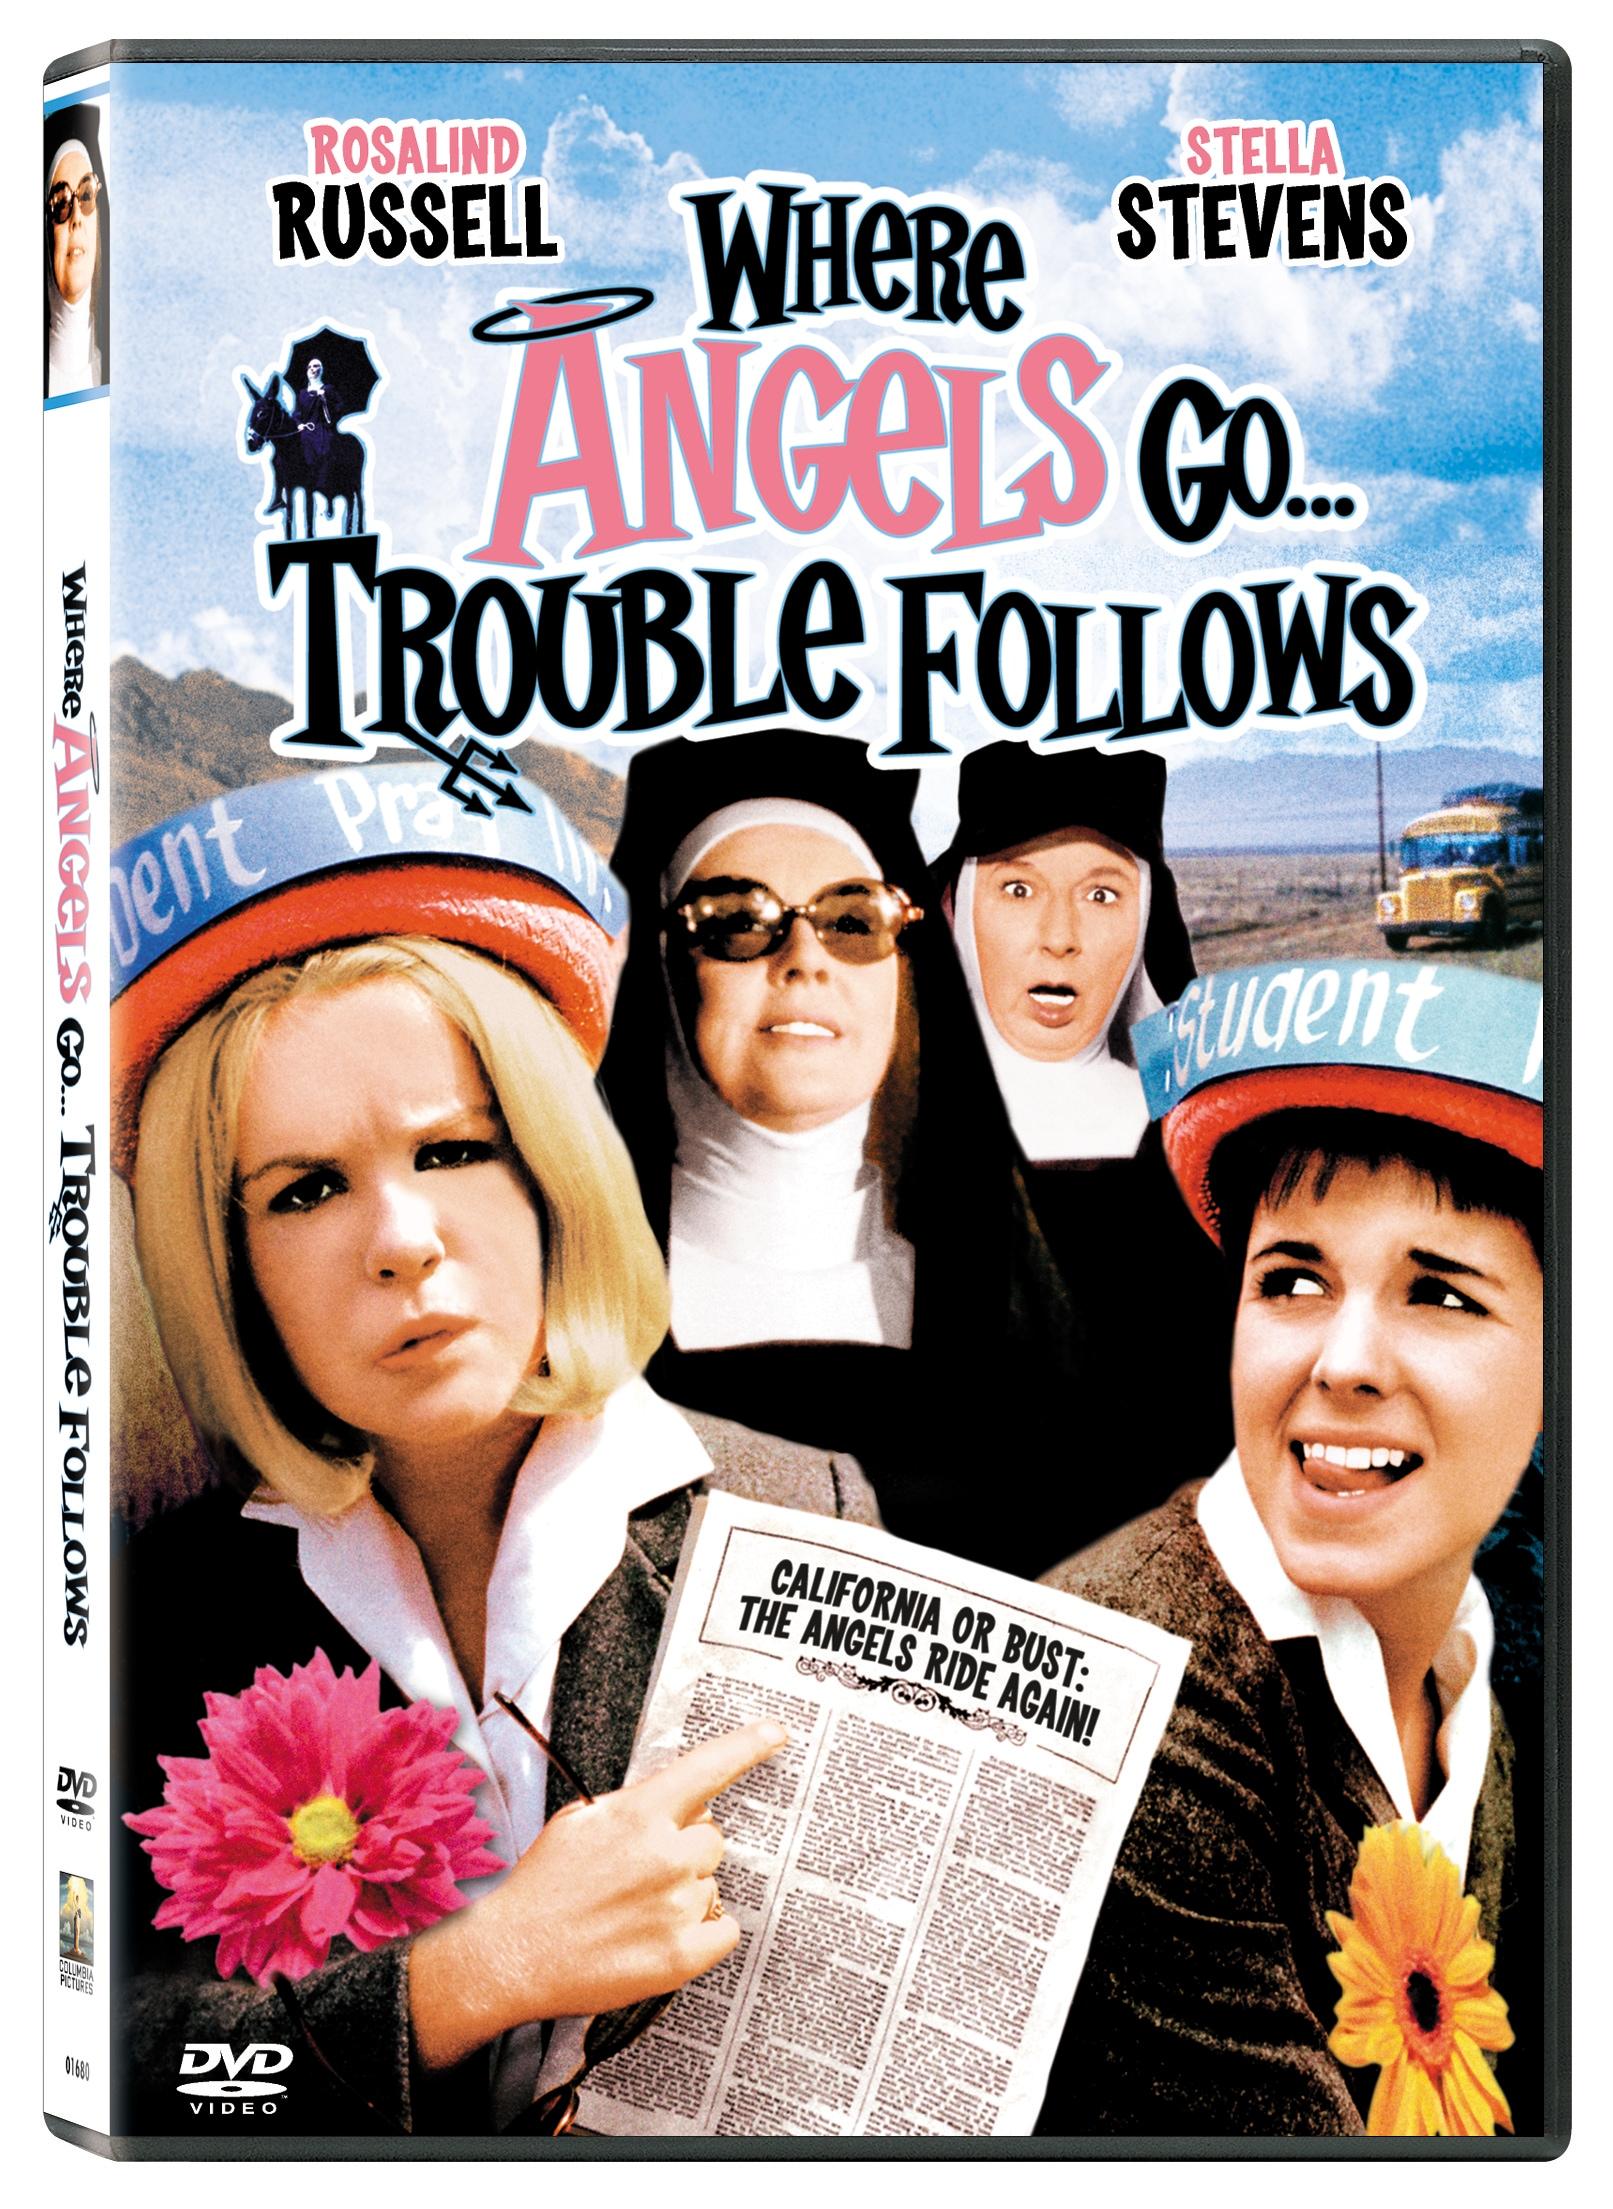 Where Angels Go Trouble Follows (DVD)